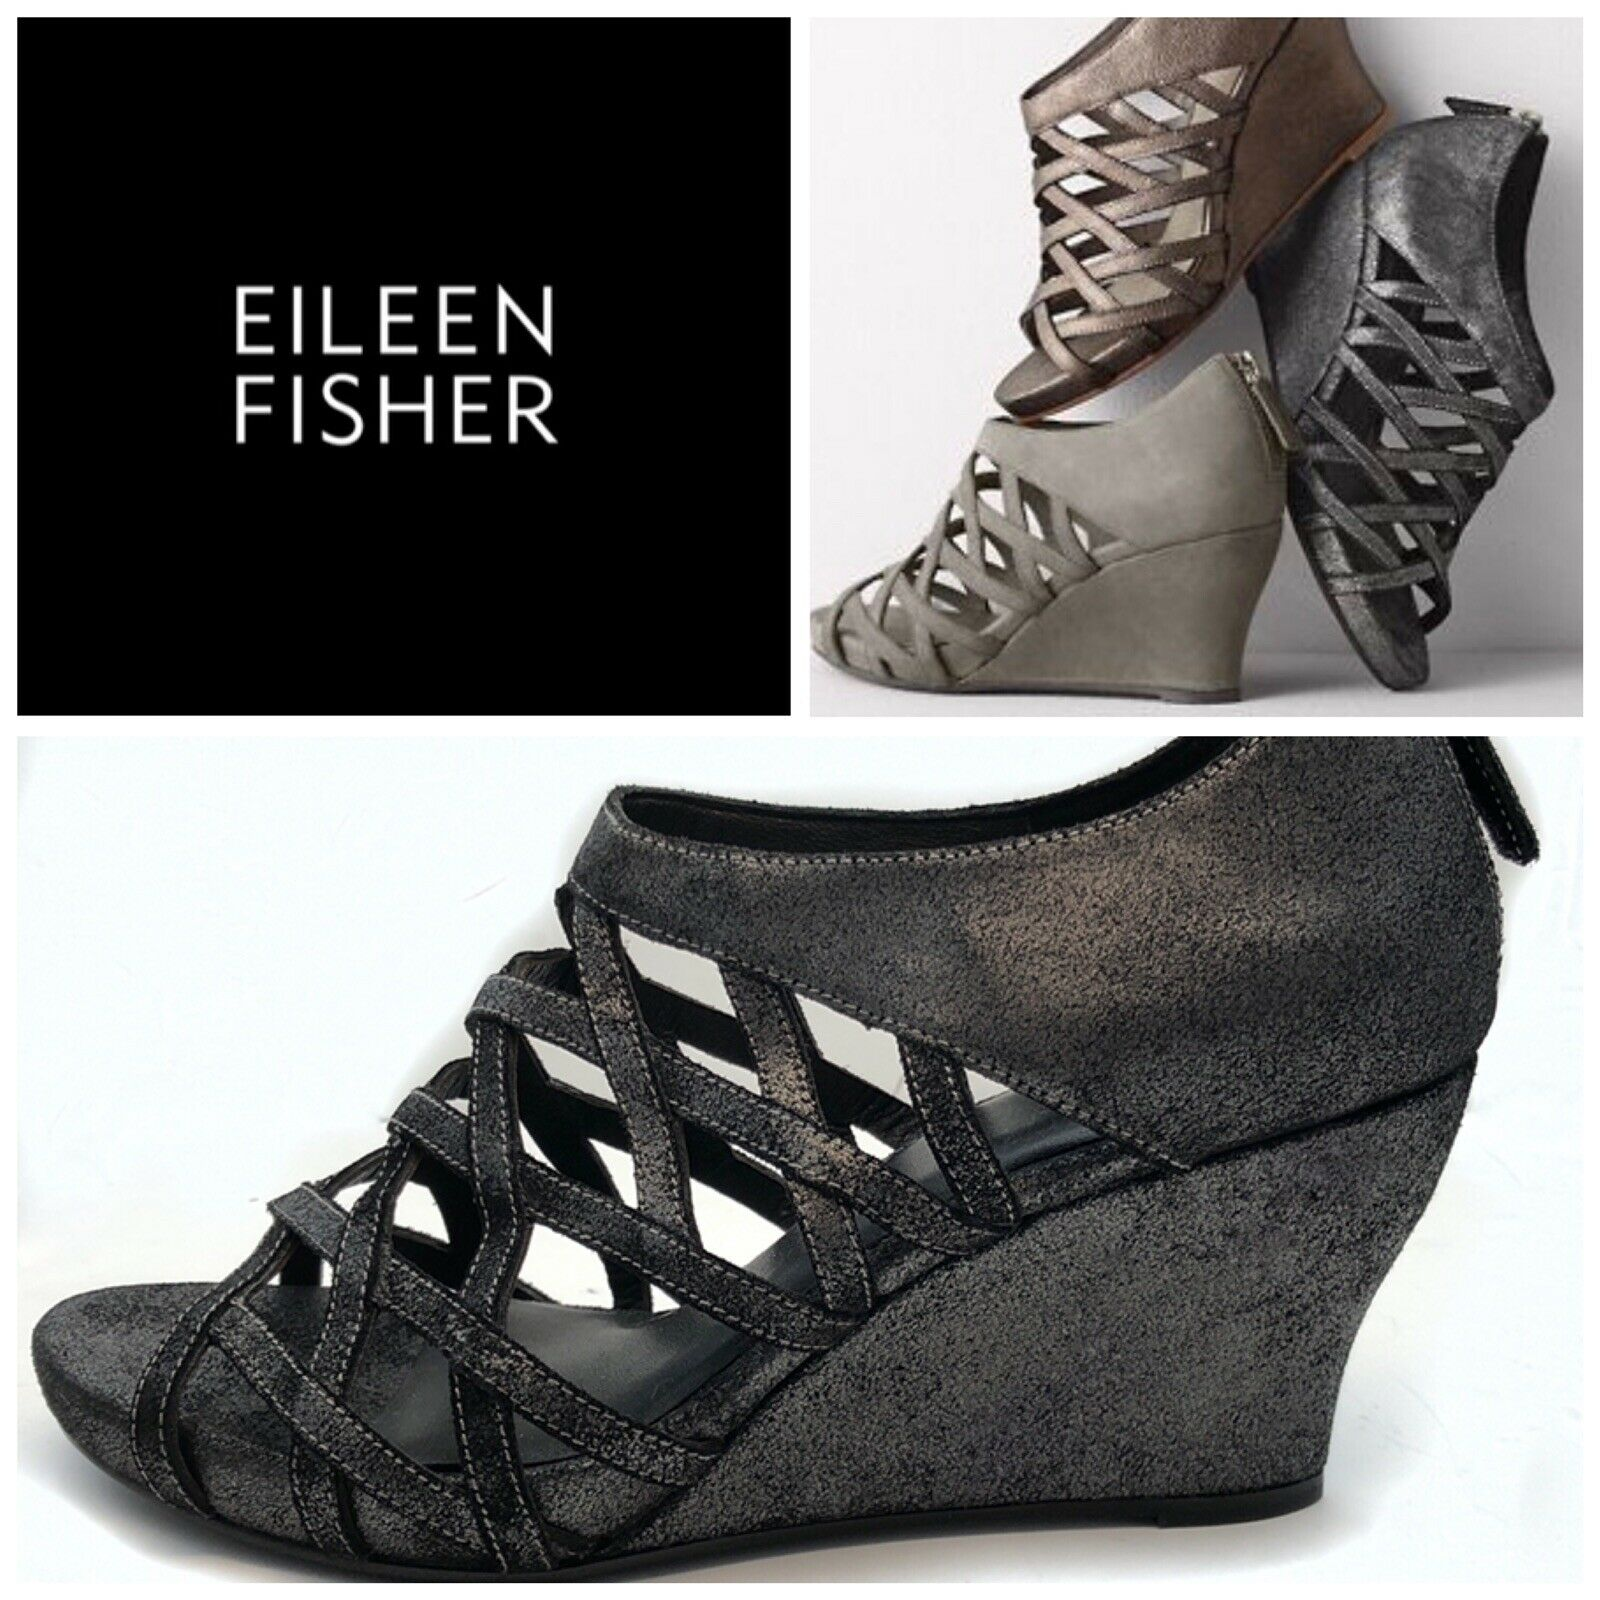 Nueva Eileen Fisher Jaula Con Tiras Cuero Sandalia de cuña Metálico gris Plomo Gamuza 8 M